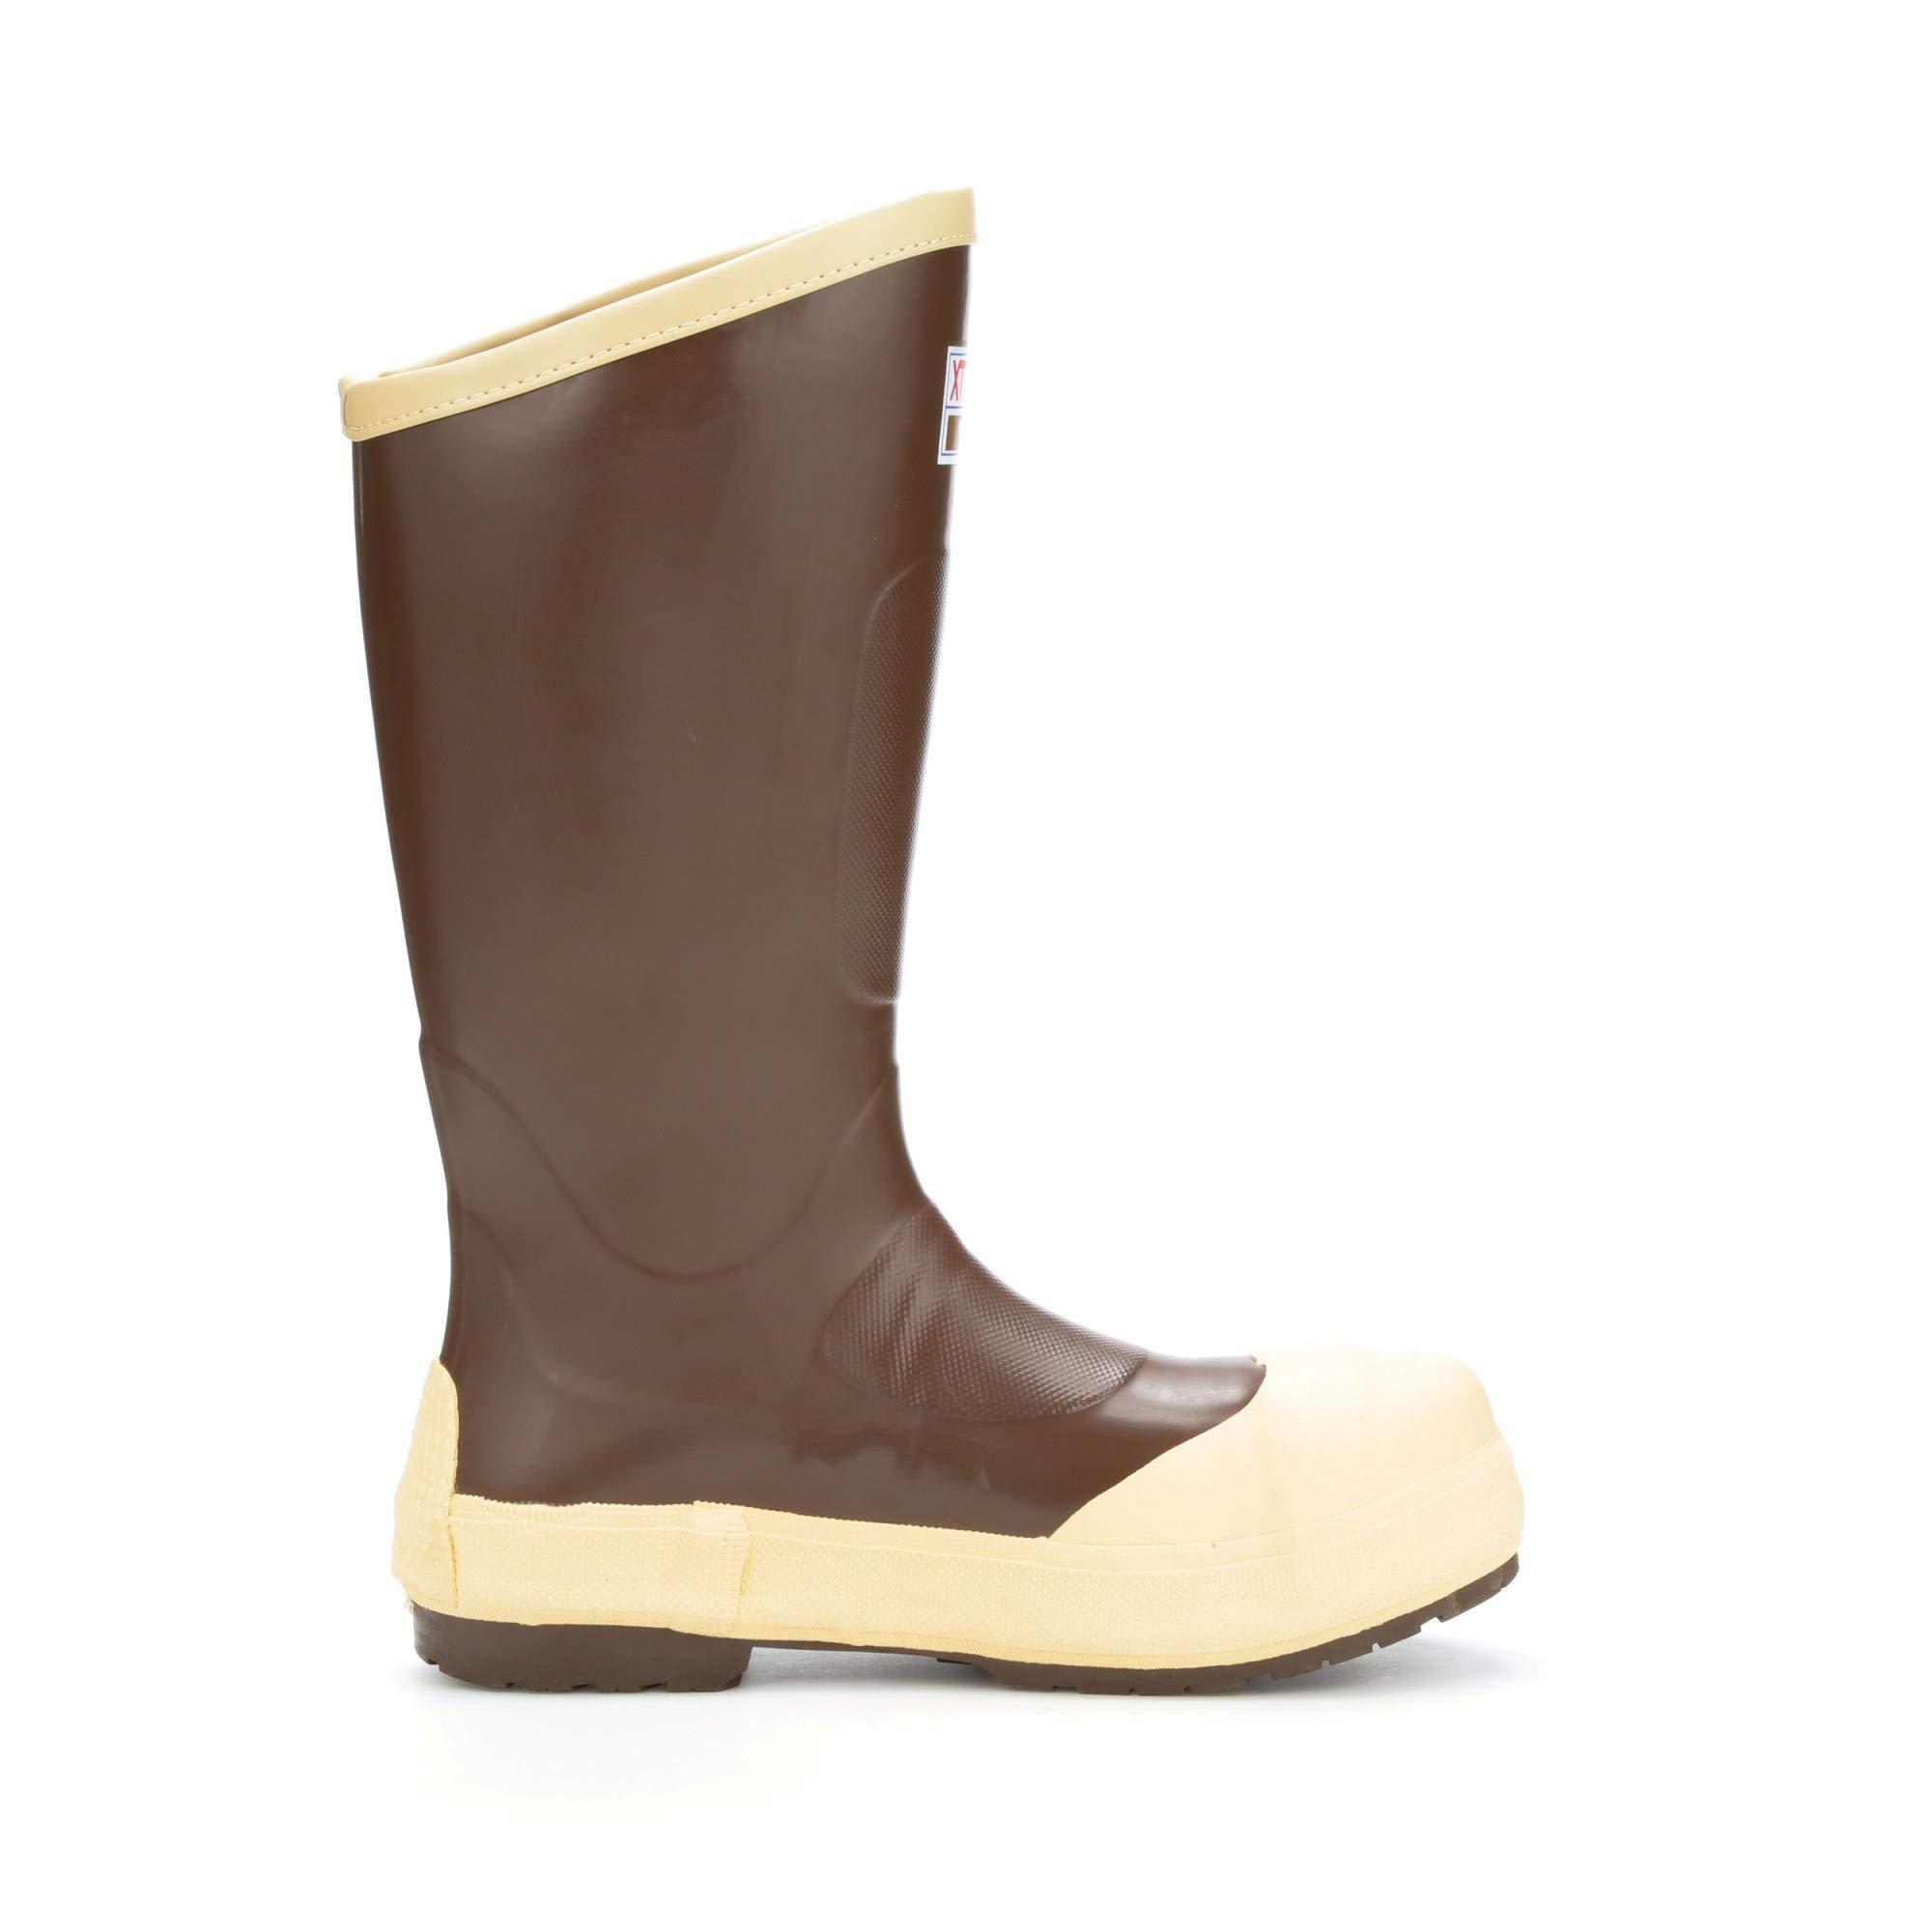 XTRATUF Legacy 2.0 Series 15'' Neoprene Composite Toe Men's Fishing Boots, Copper & Tan (22292G) by Xtratuf (Image #6)